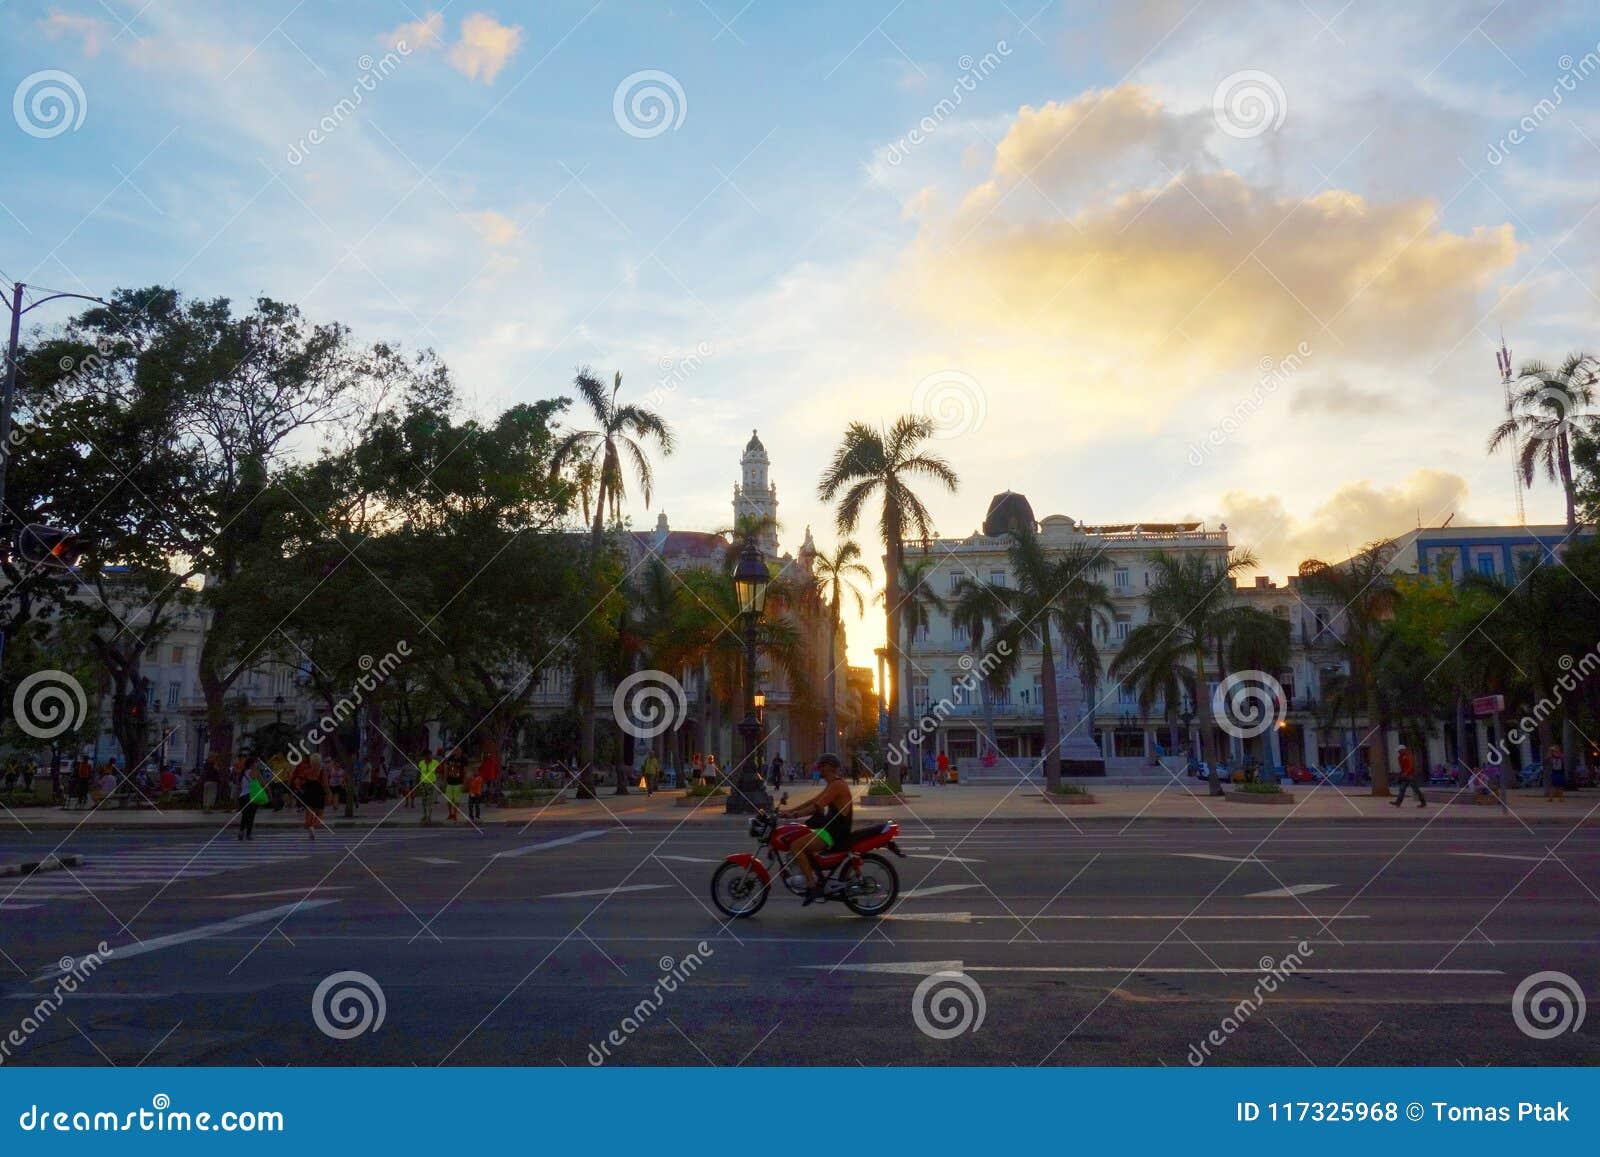 Colorful colonial buildings with motorbike, Havana, Cuba